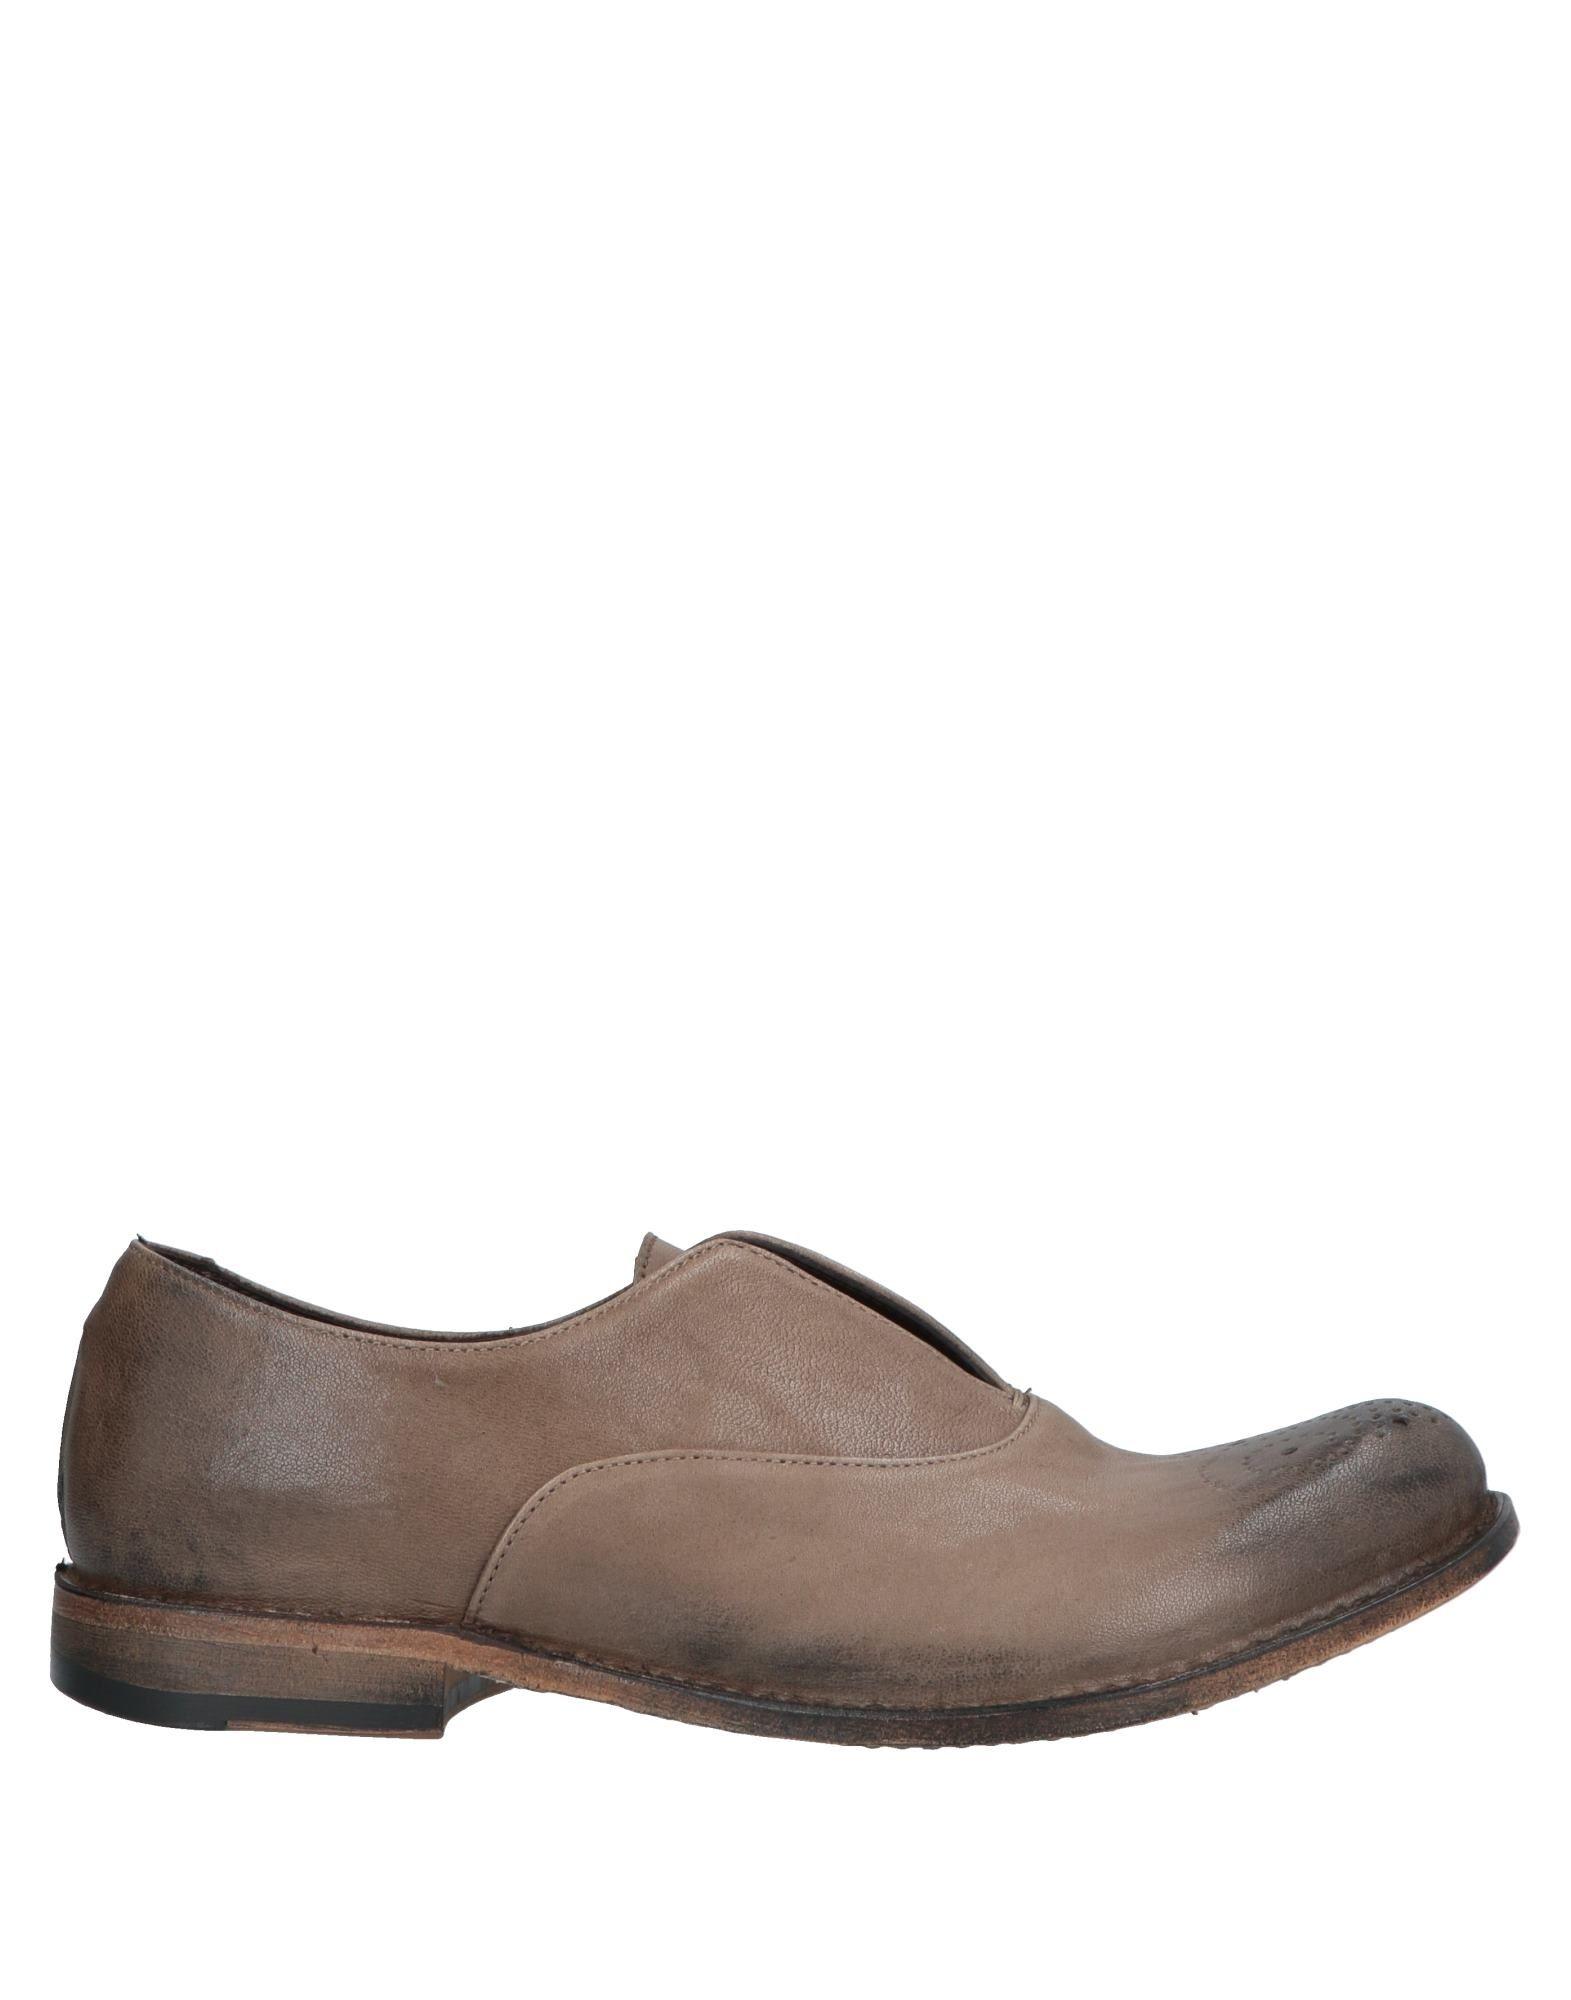 Фото - OPEN CLOSED SHOES Мокасины women high heel shoes platform pumps woman thin high heels party wedding shoes ladies kitten heels plus size 34 40 41 42 43